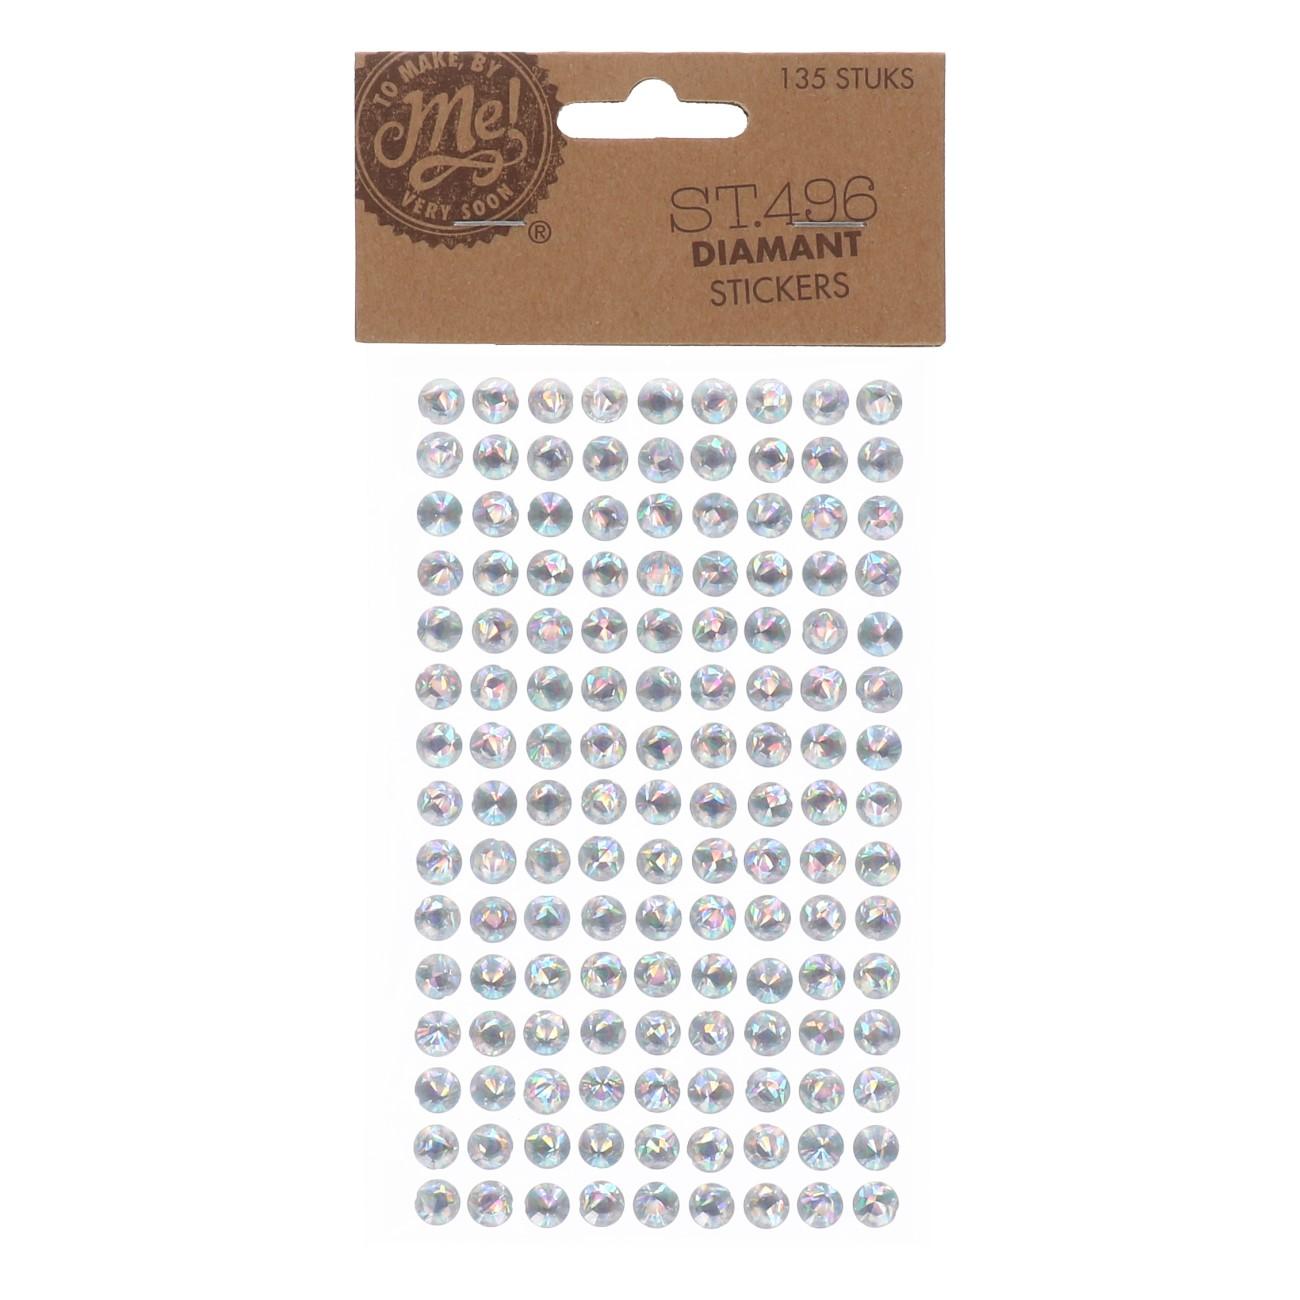 Diamant stickers st.496 135stuks